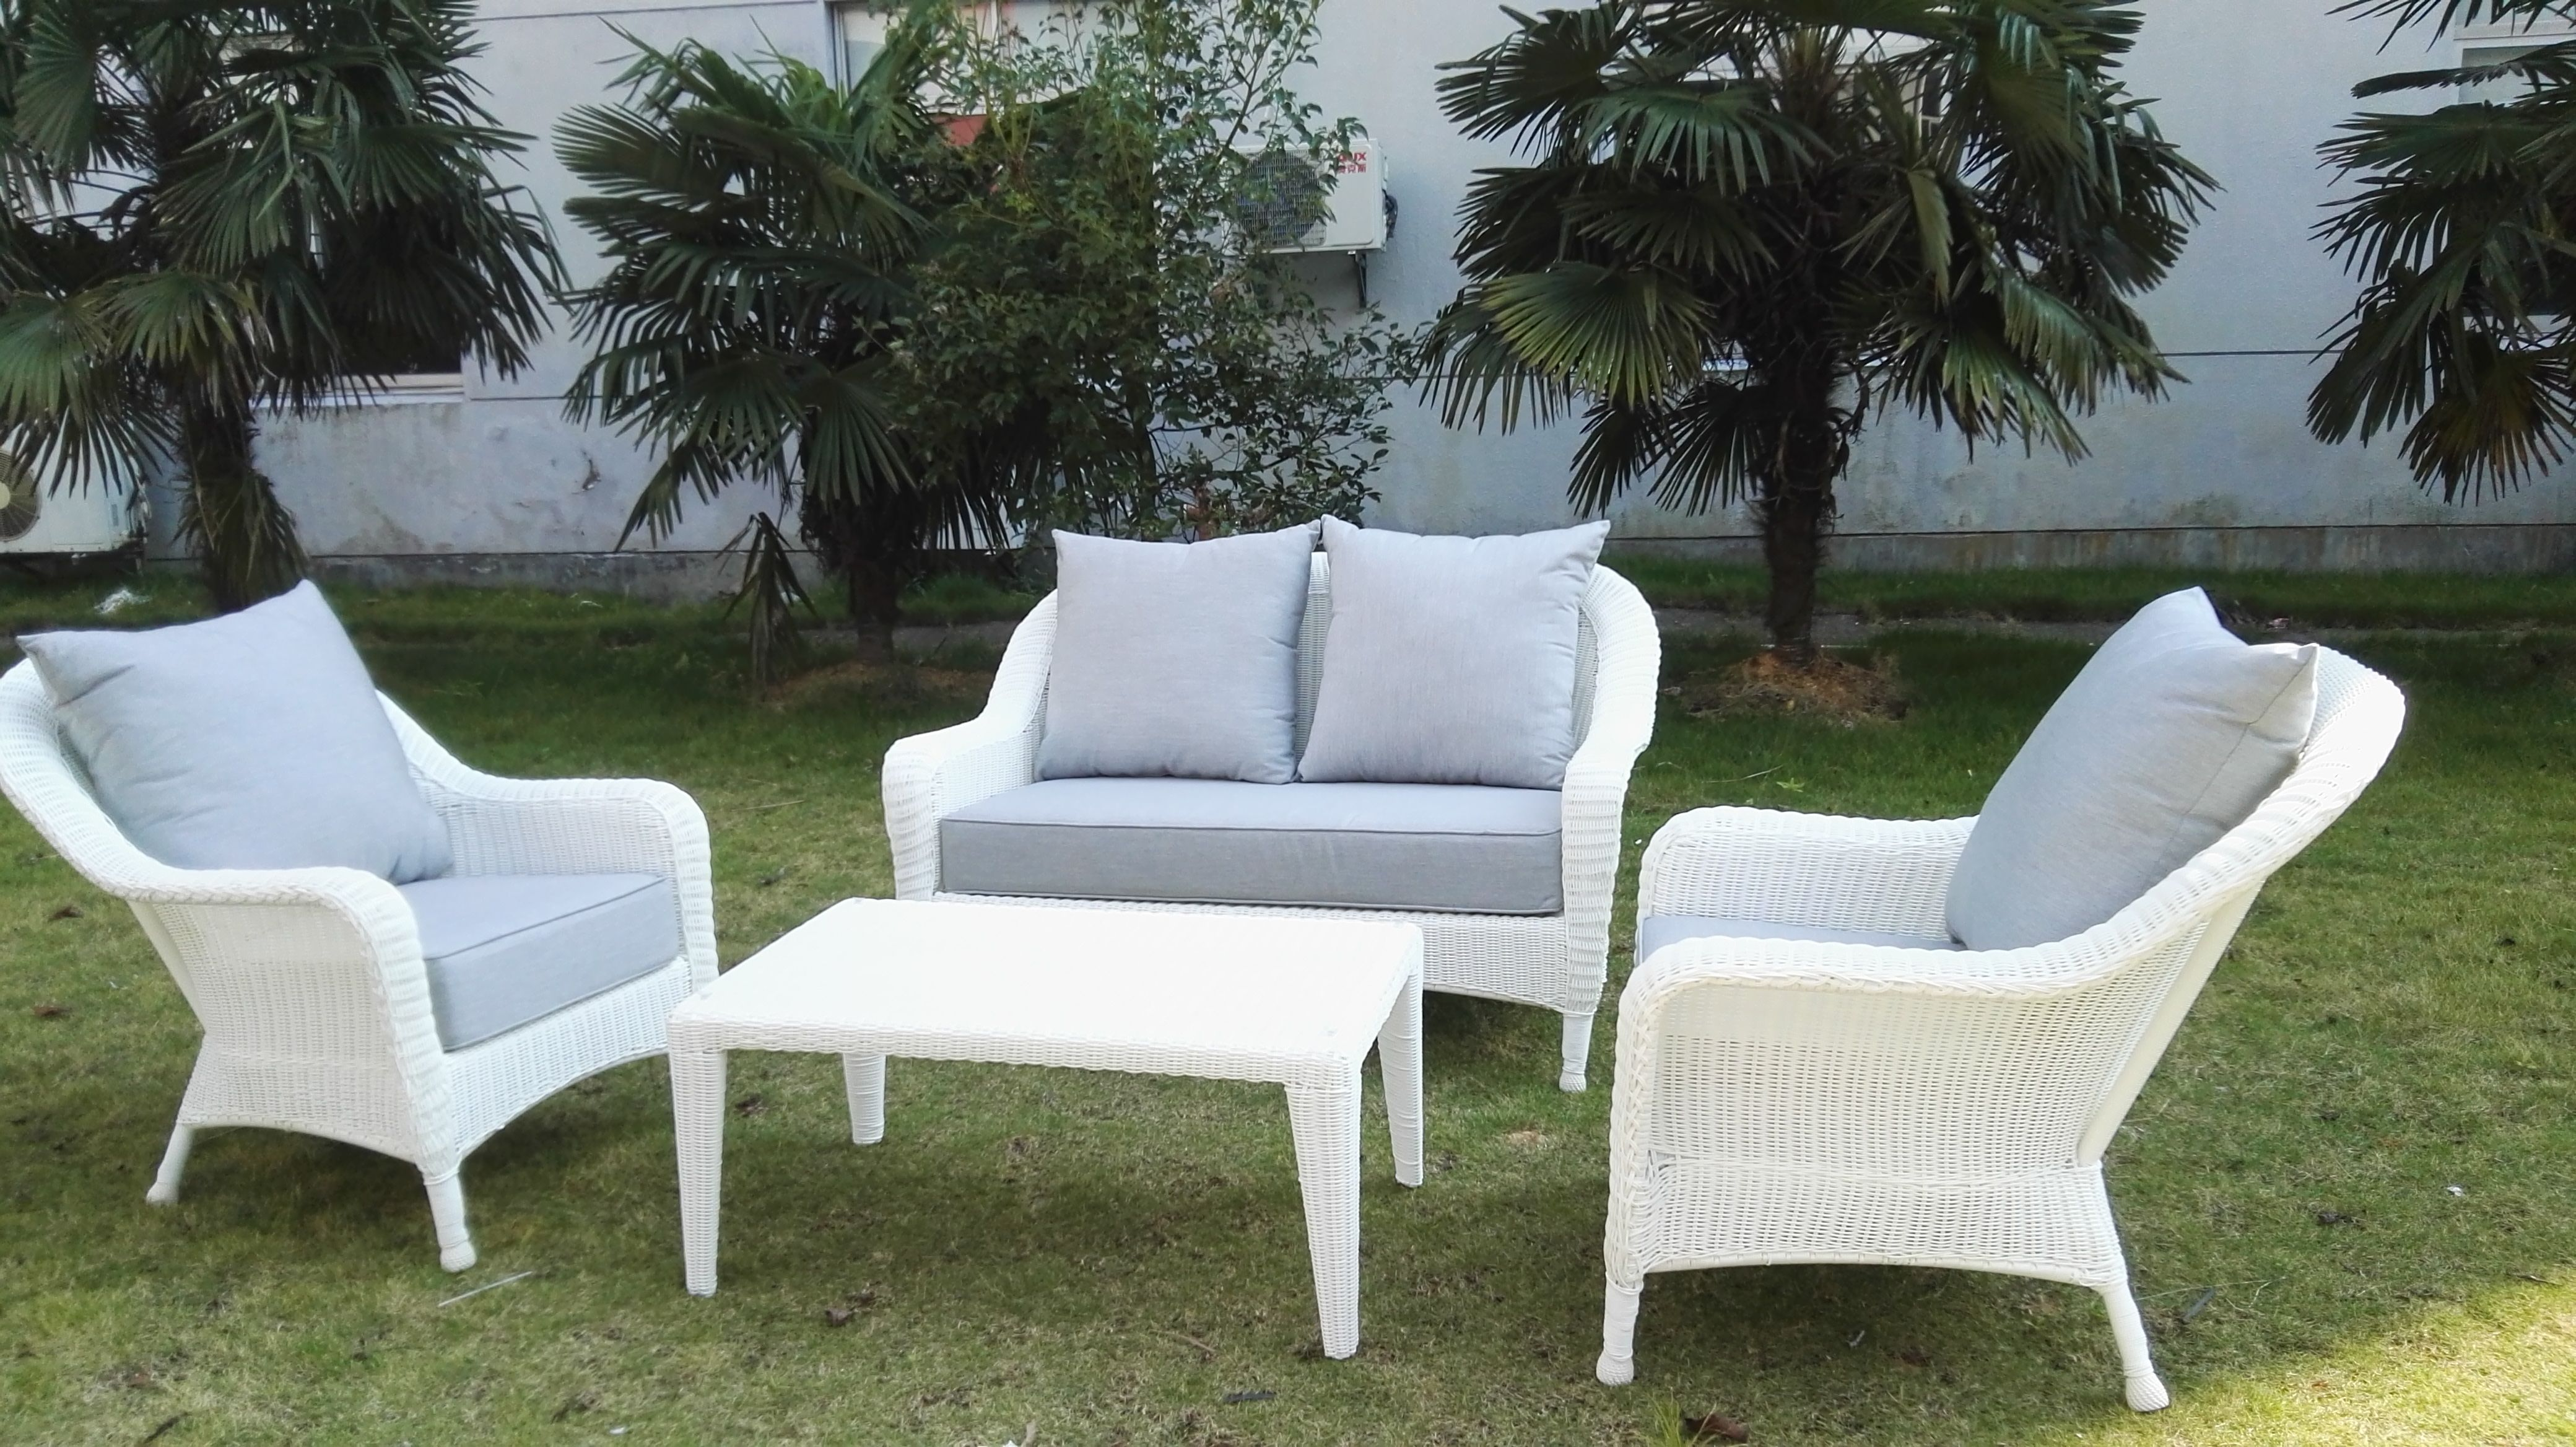 home depot outdoor furniture TG 16162 rattan sofa